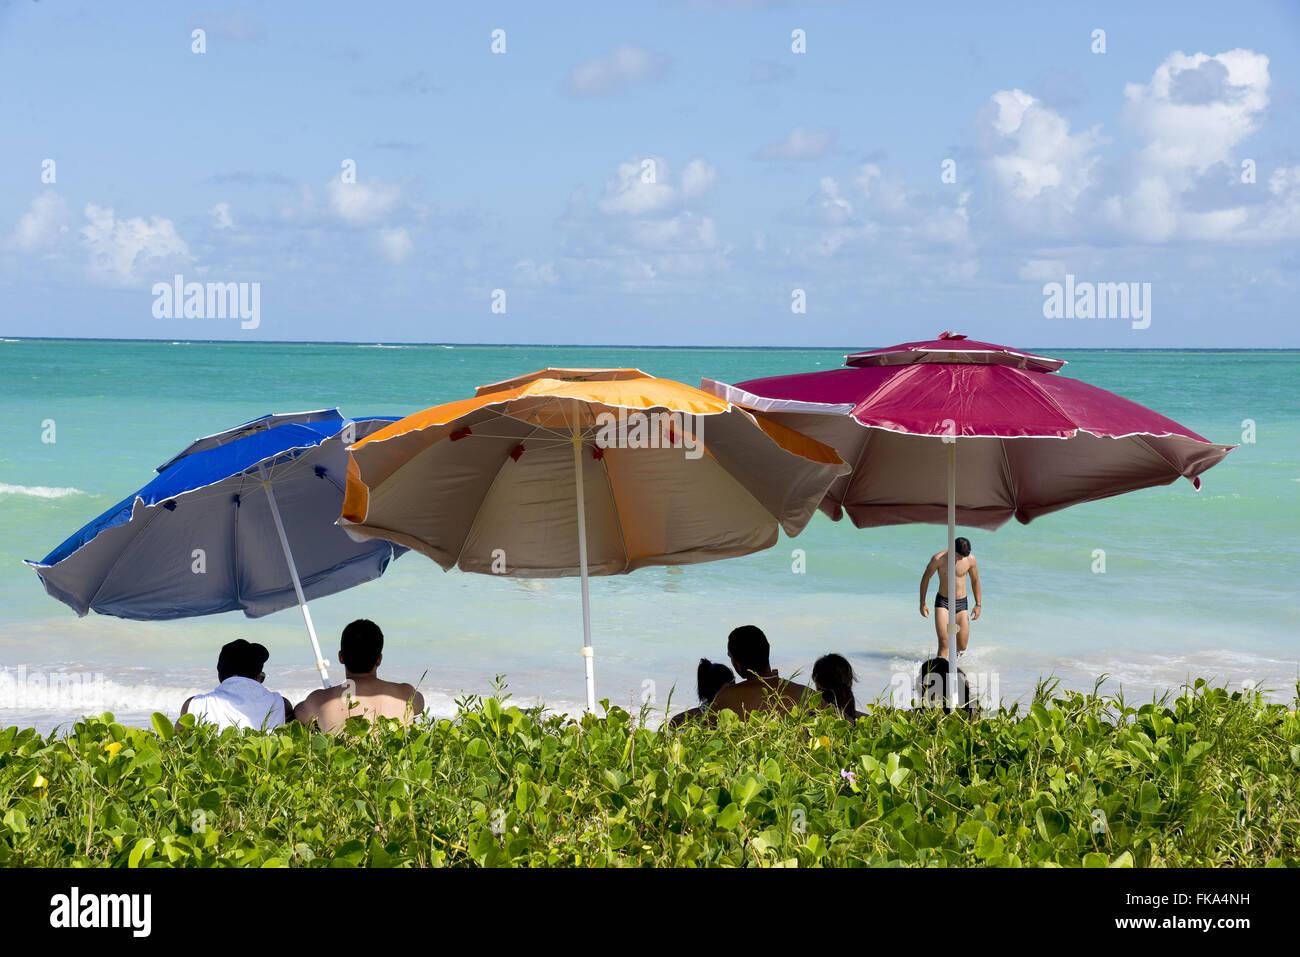 Umbrellas and sunbathers on the beach Antunes - Stock Image